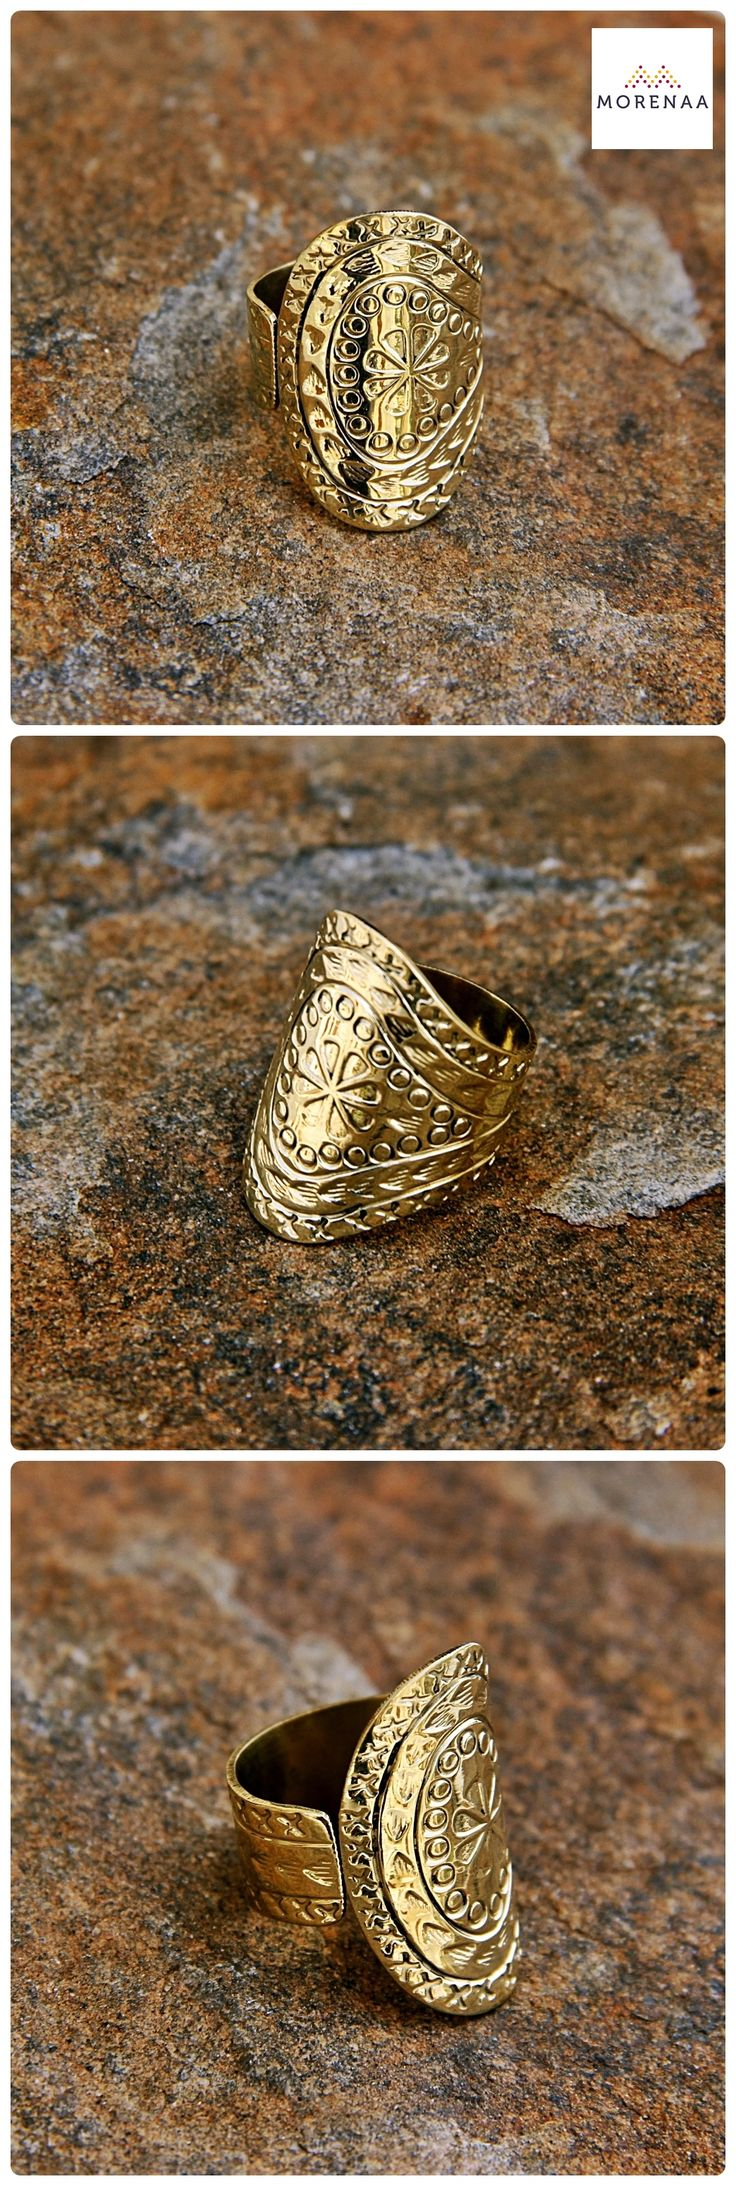 Boho ✤ Chic Anillos hechos en India $7.990 #anillos #rings #bohemianstyle #morenaa #lomejordecadalugar ✤✤✤✤✤✤✤✤